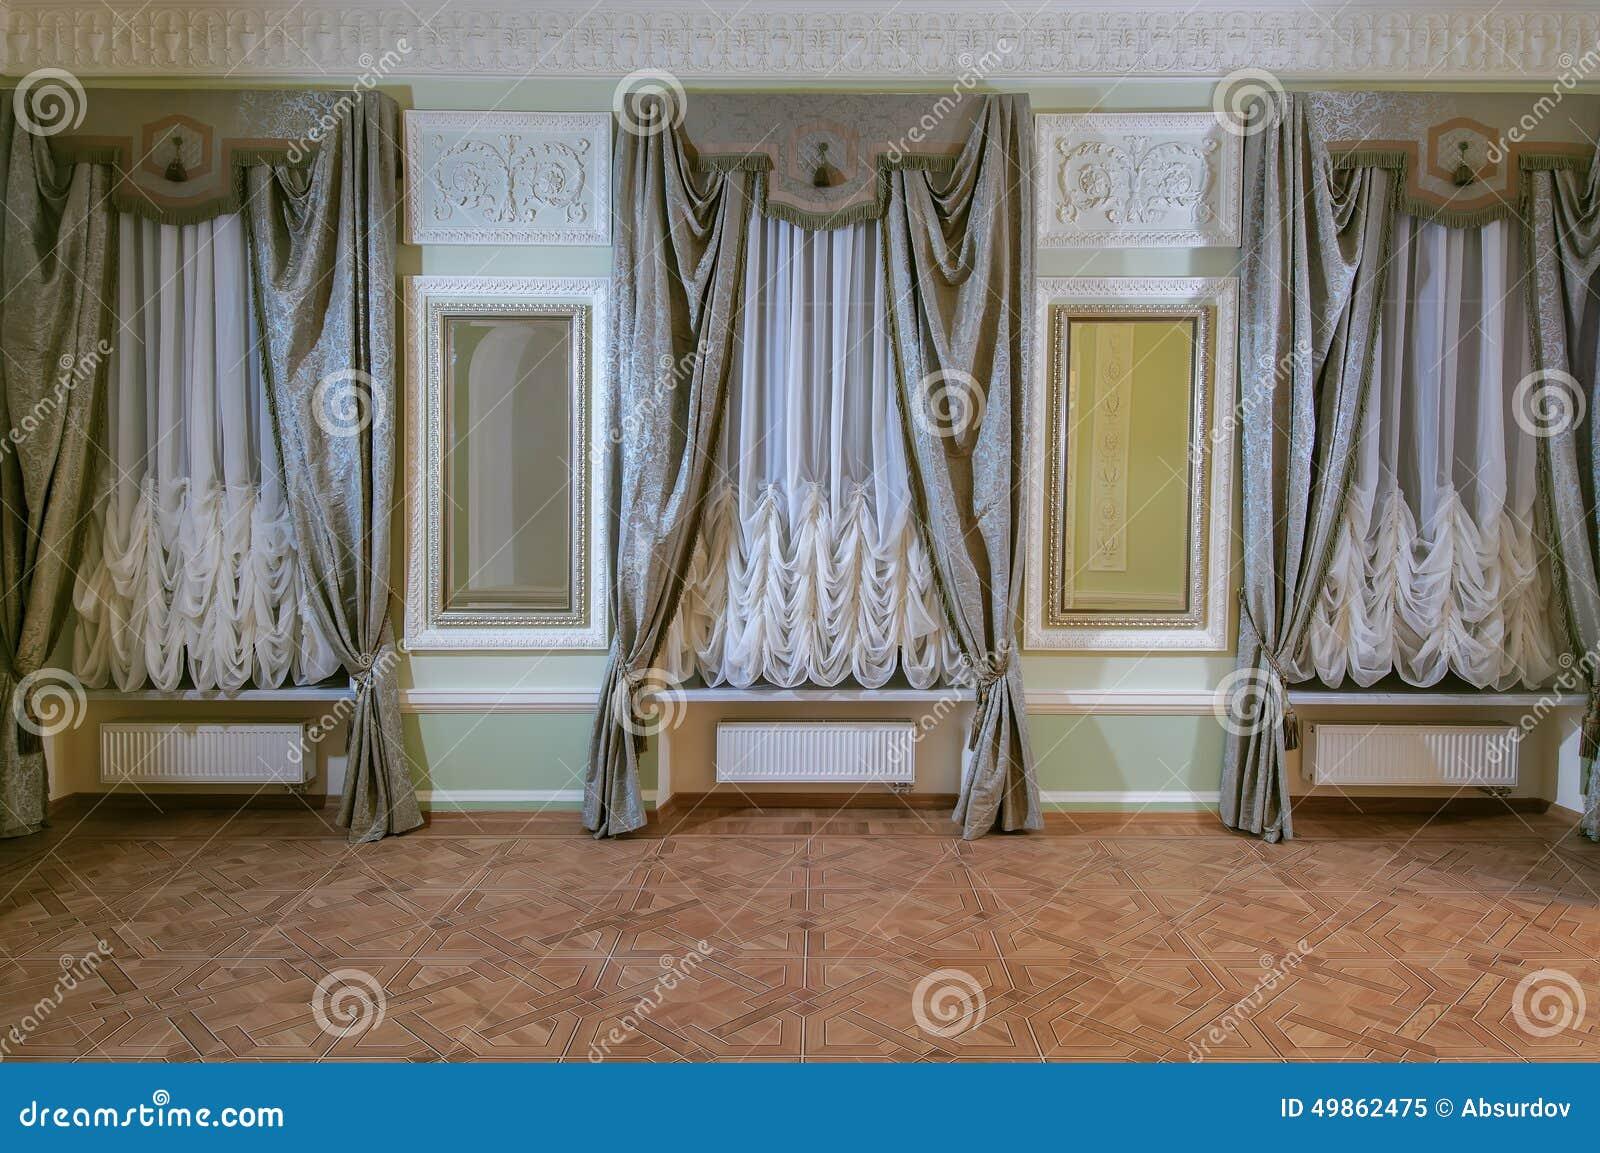 in einer gro en halle 3 curtained fenster vorh nge stockbild bild von trennvorh nge innen. Black Bedroom Furniture Sets. Home Design Ideas